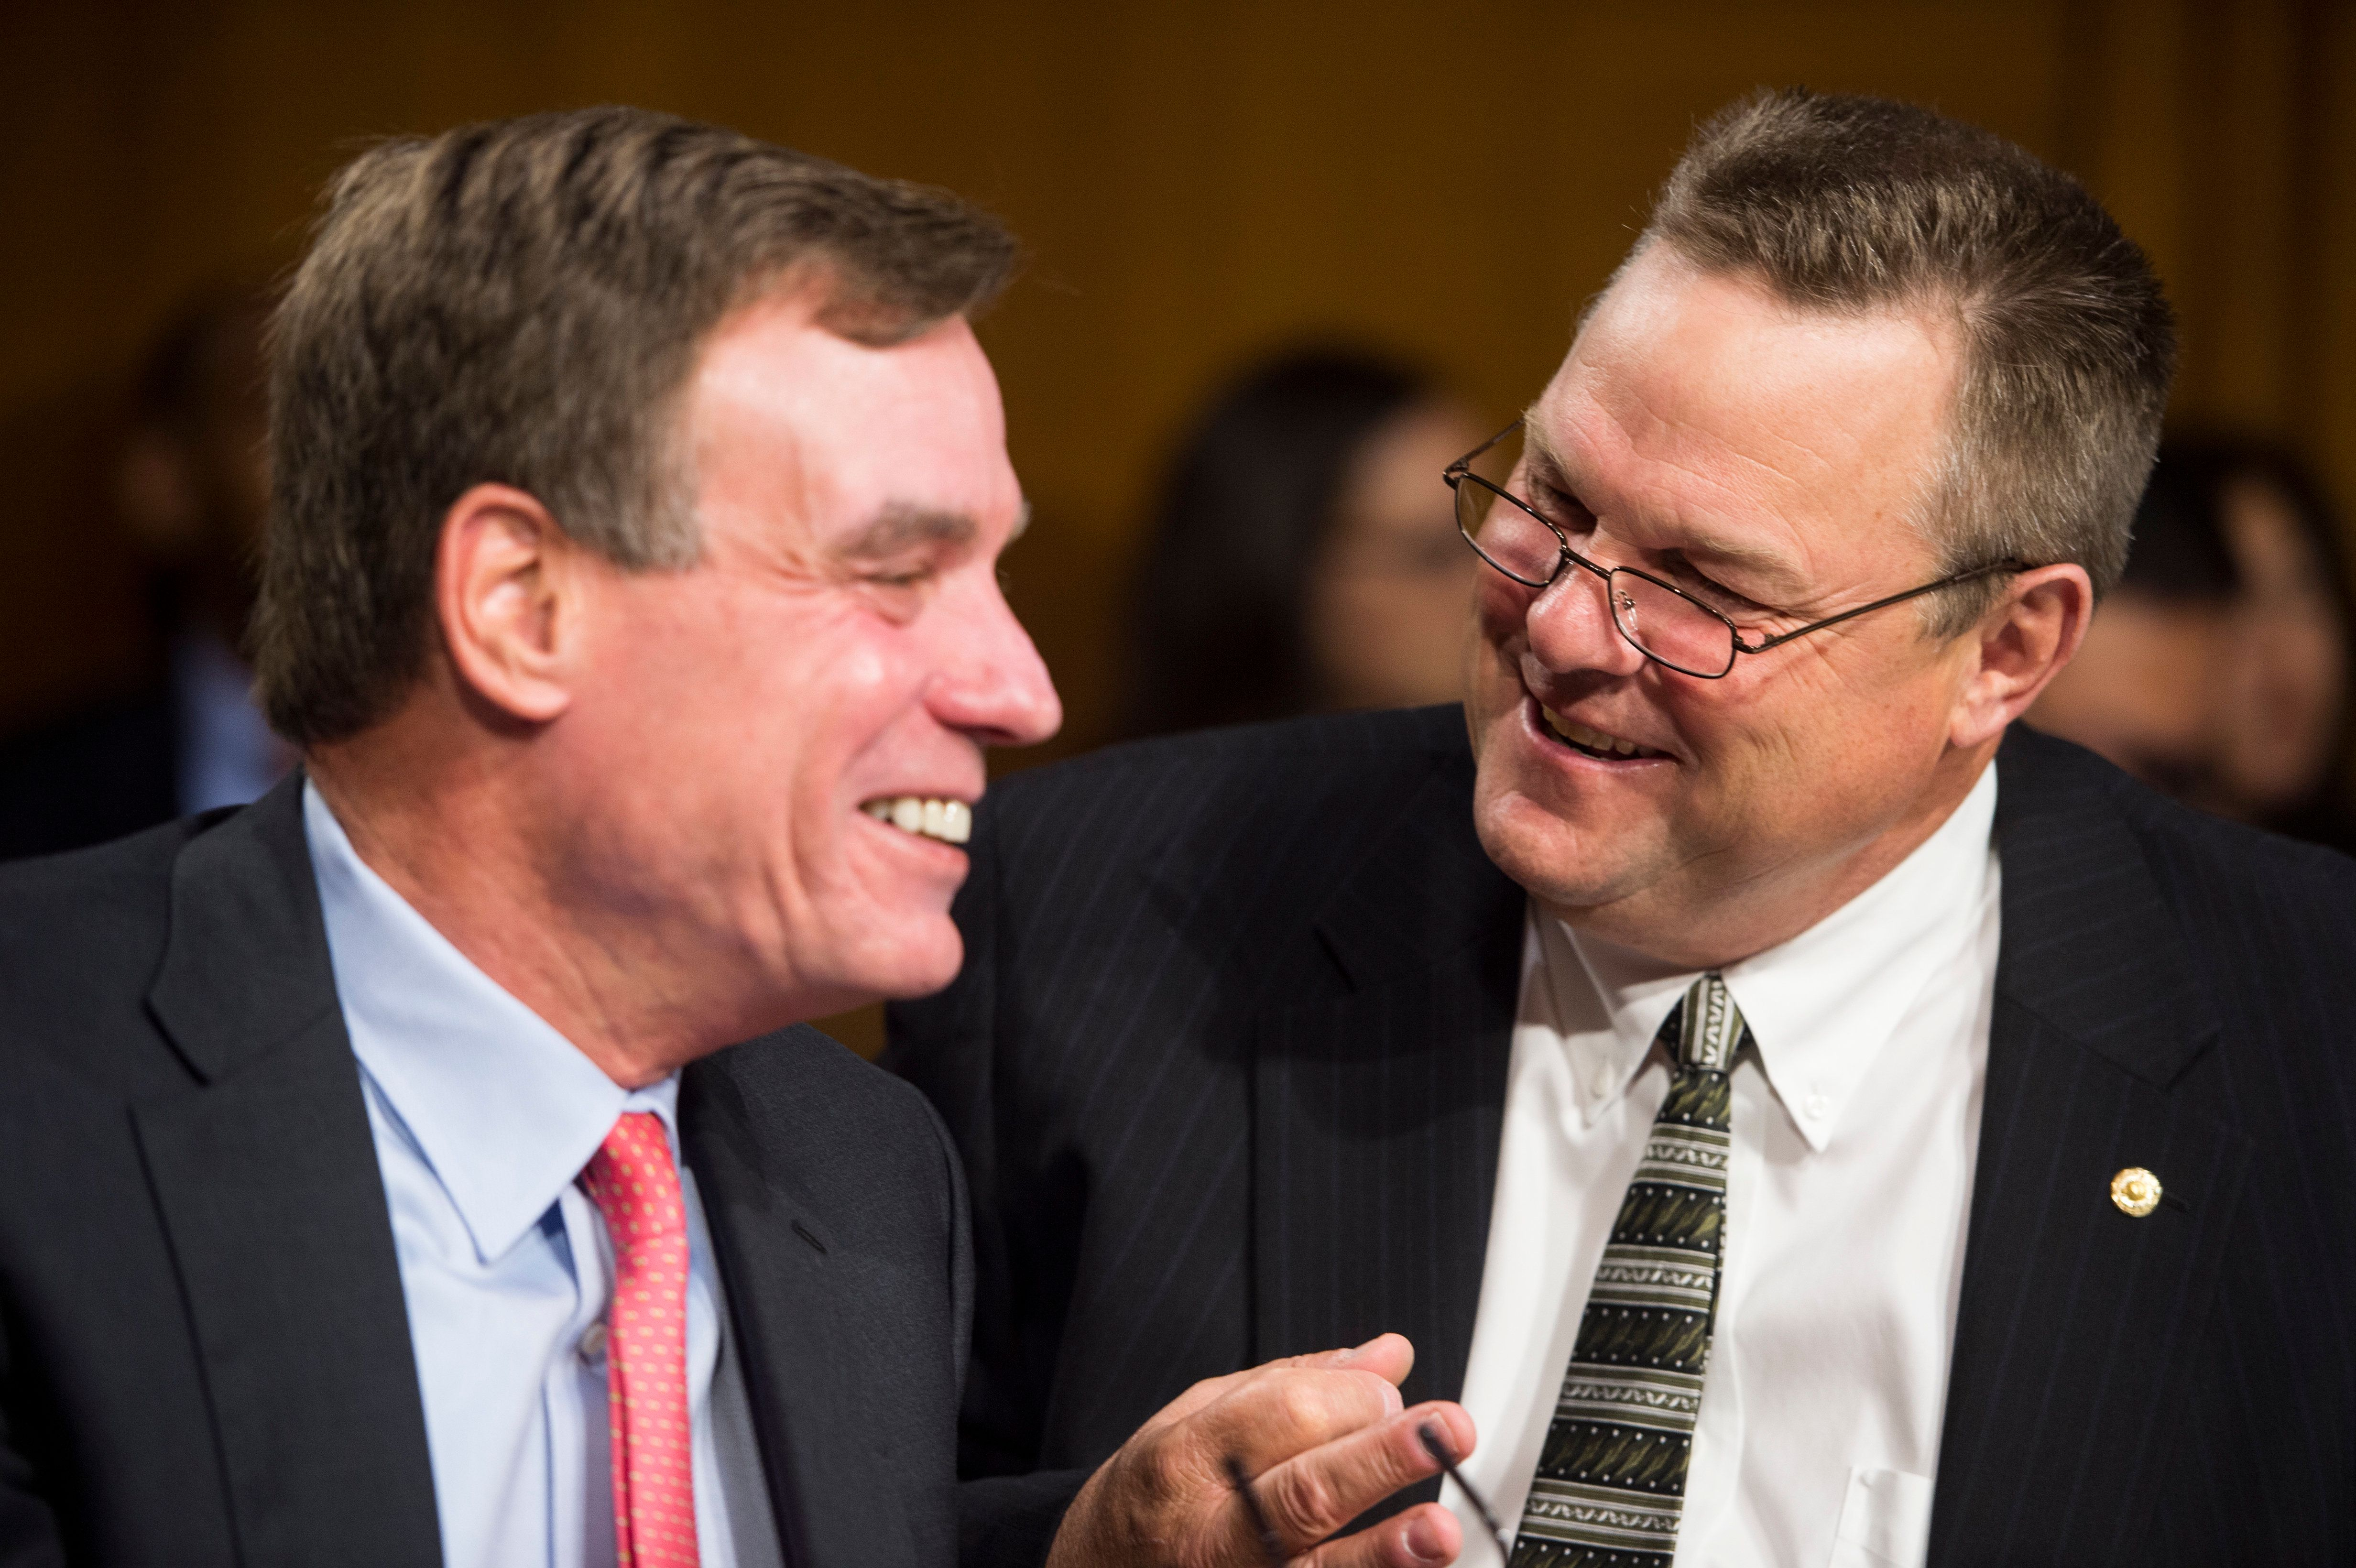 Democratic Sens. Mark Warner of Virginia, left, and Jon Tester of Montana areamong those backingthe nomination of